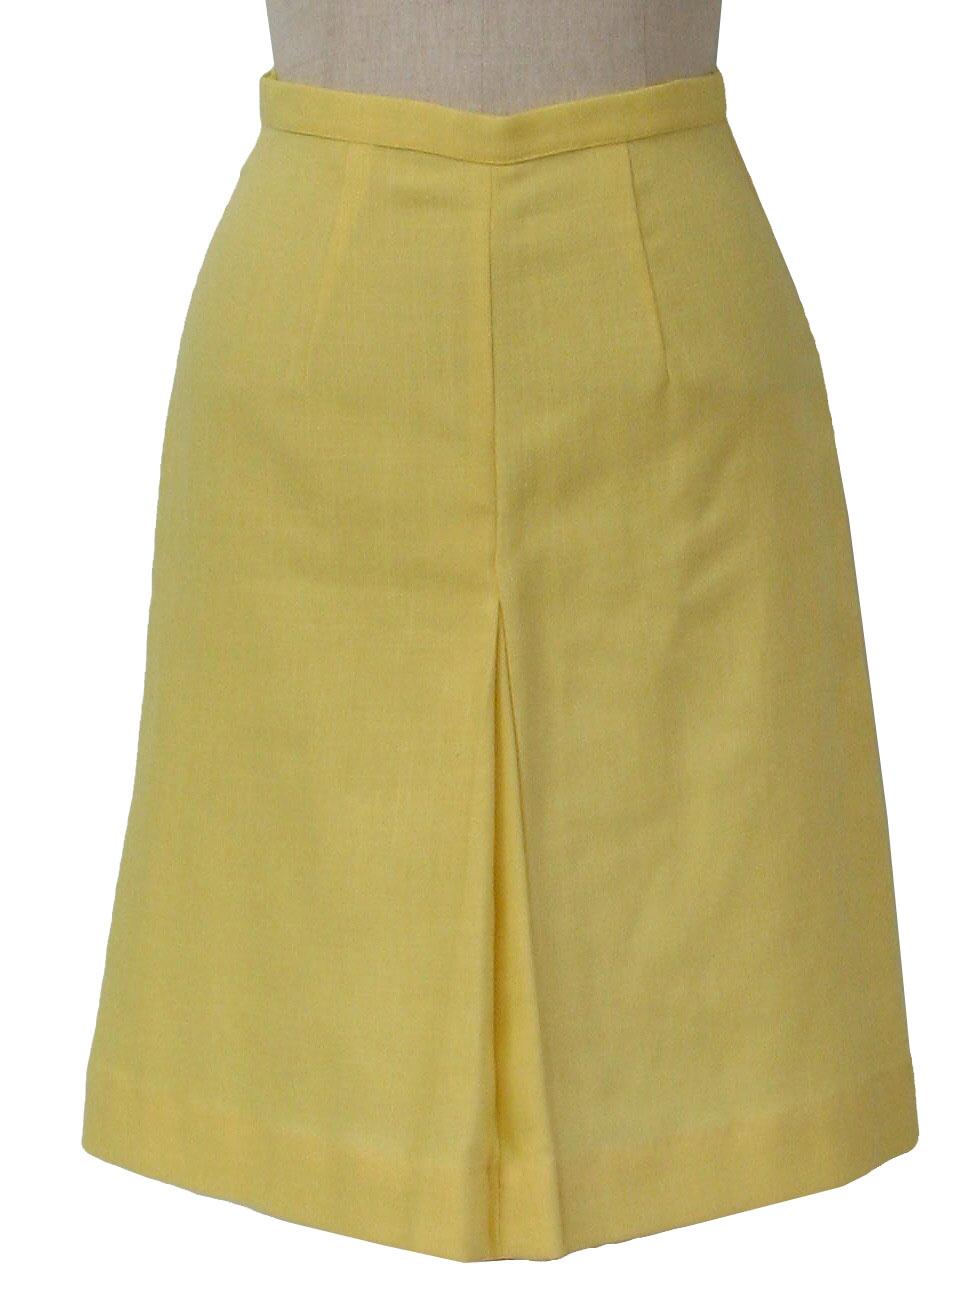 Vintage 1960's Skirt: Early 60s -Cut Label- Womens lemon yellow ...